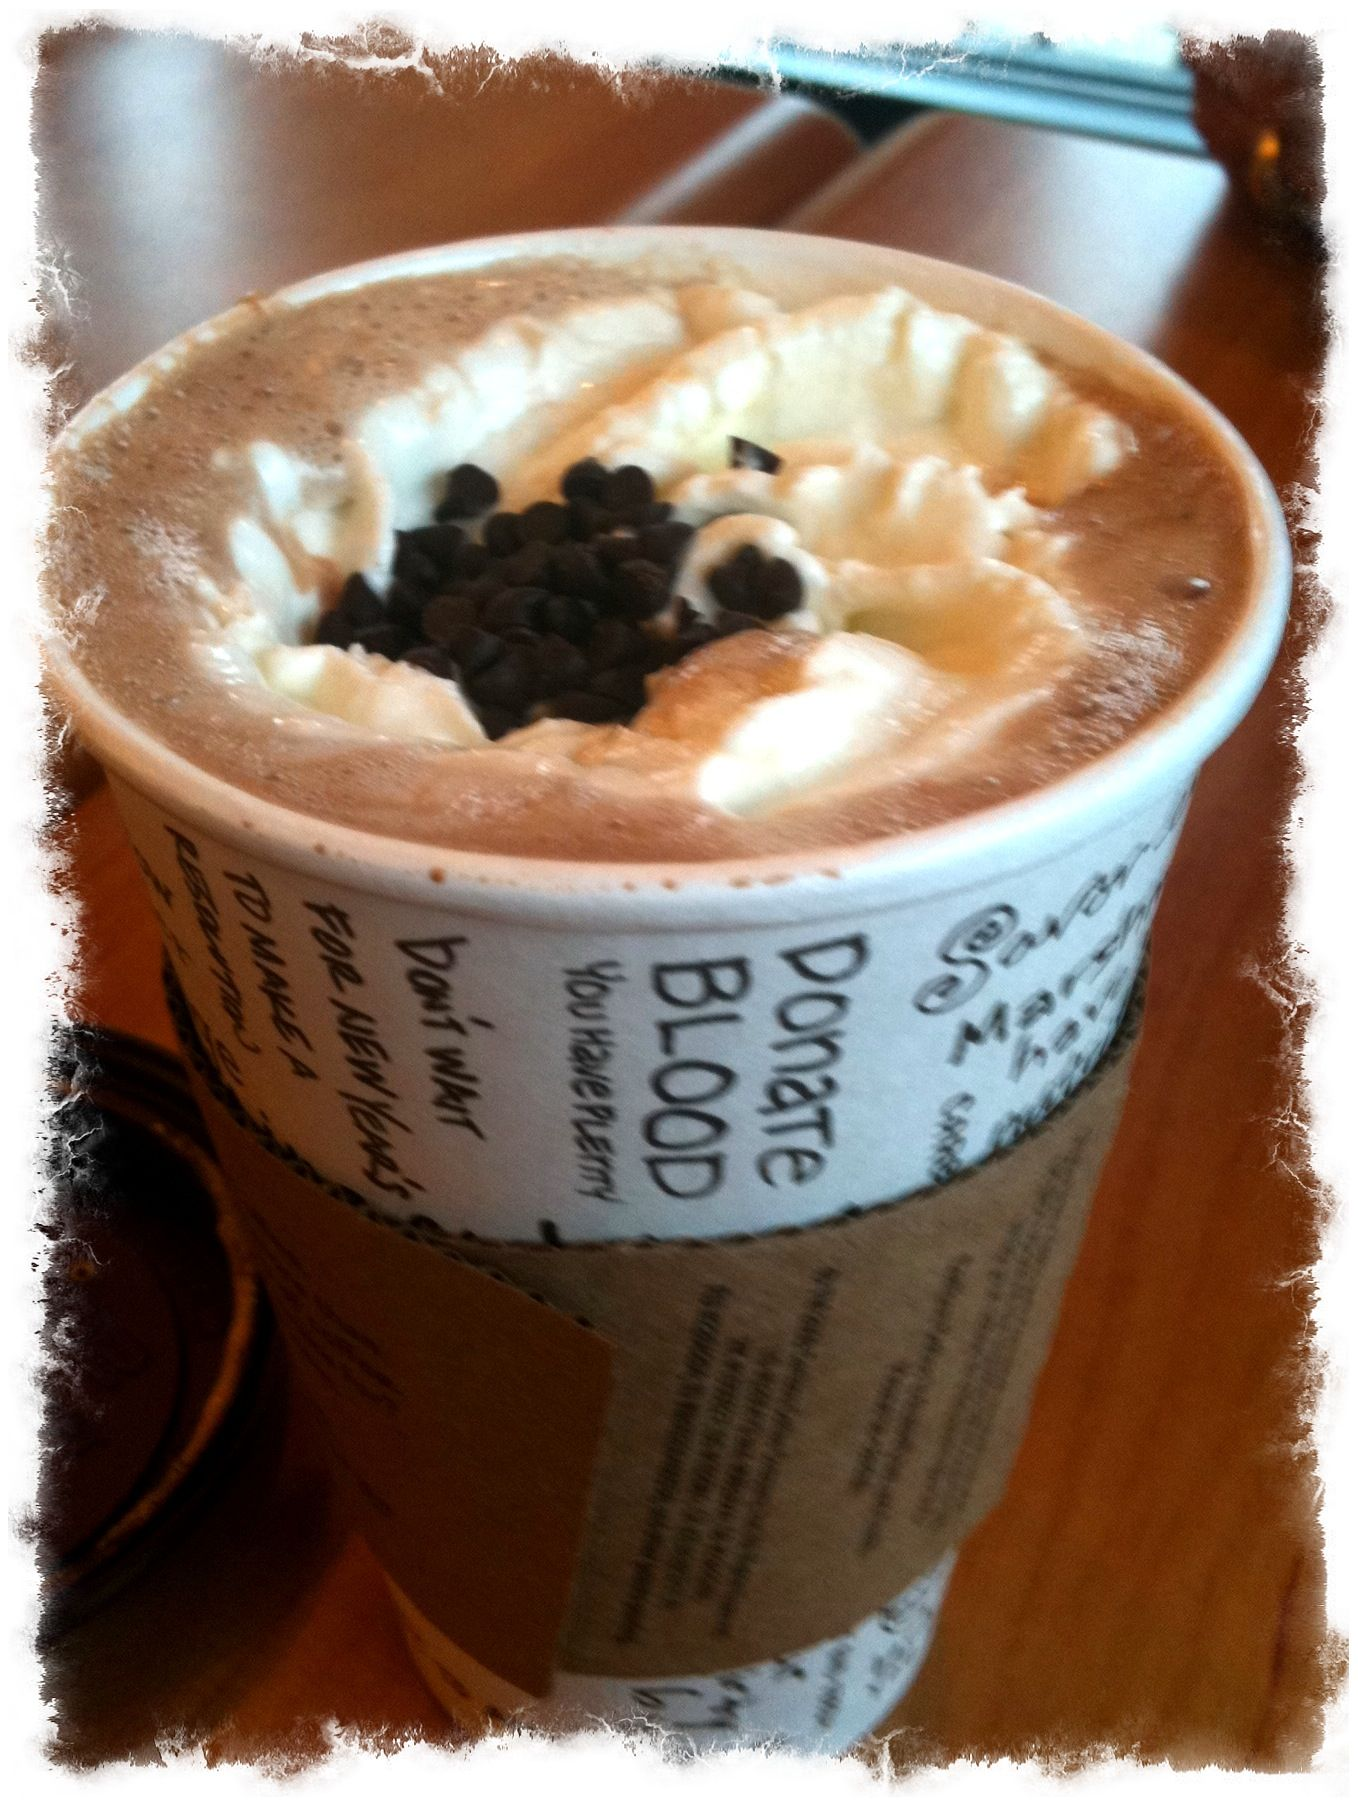 caribou-coffee---dayton-ohio_4954881991_o.jpg